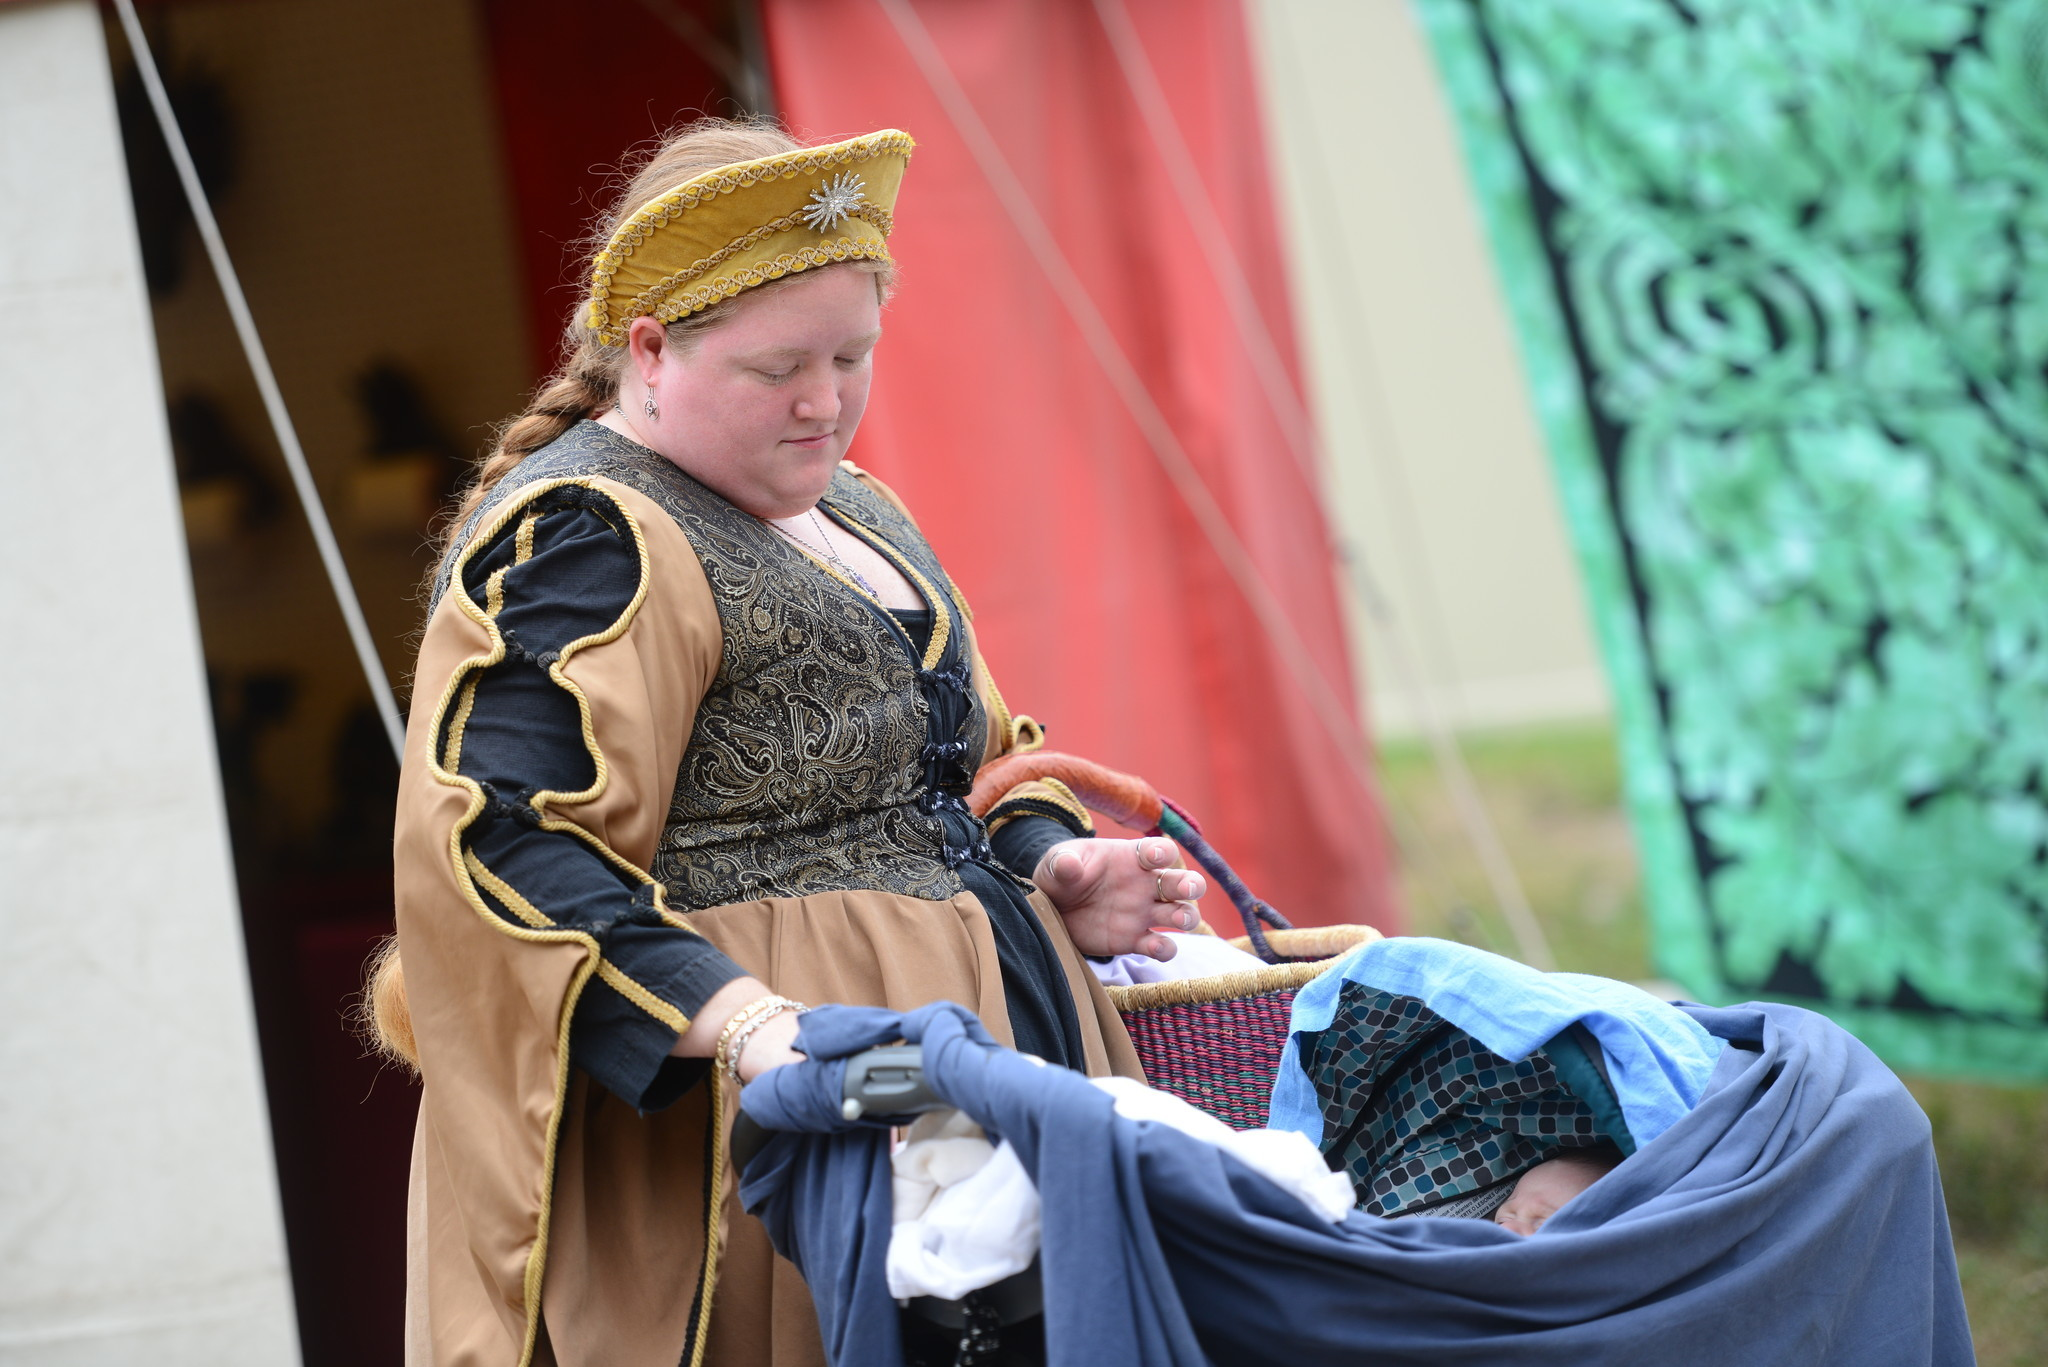 Renaissance Festival photos - Monica Taylor